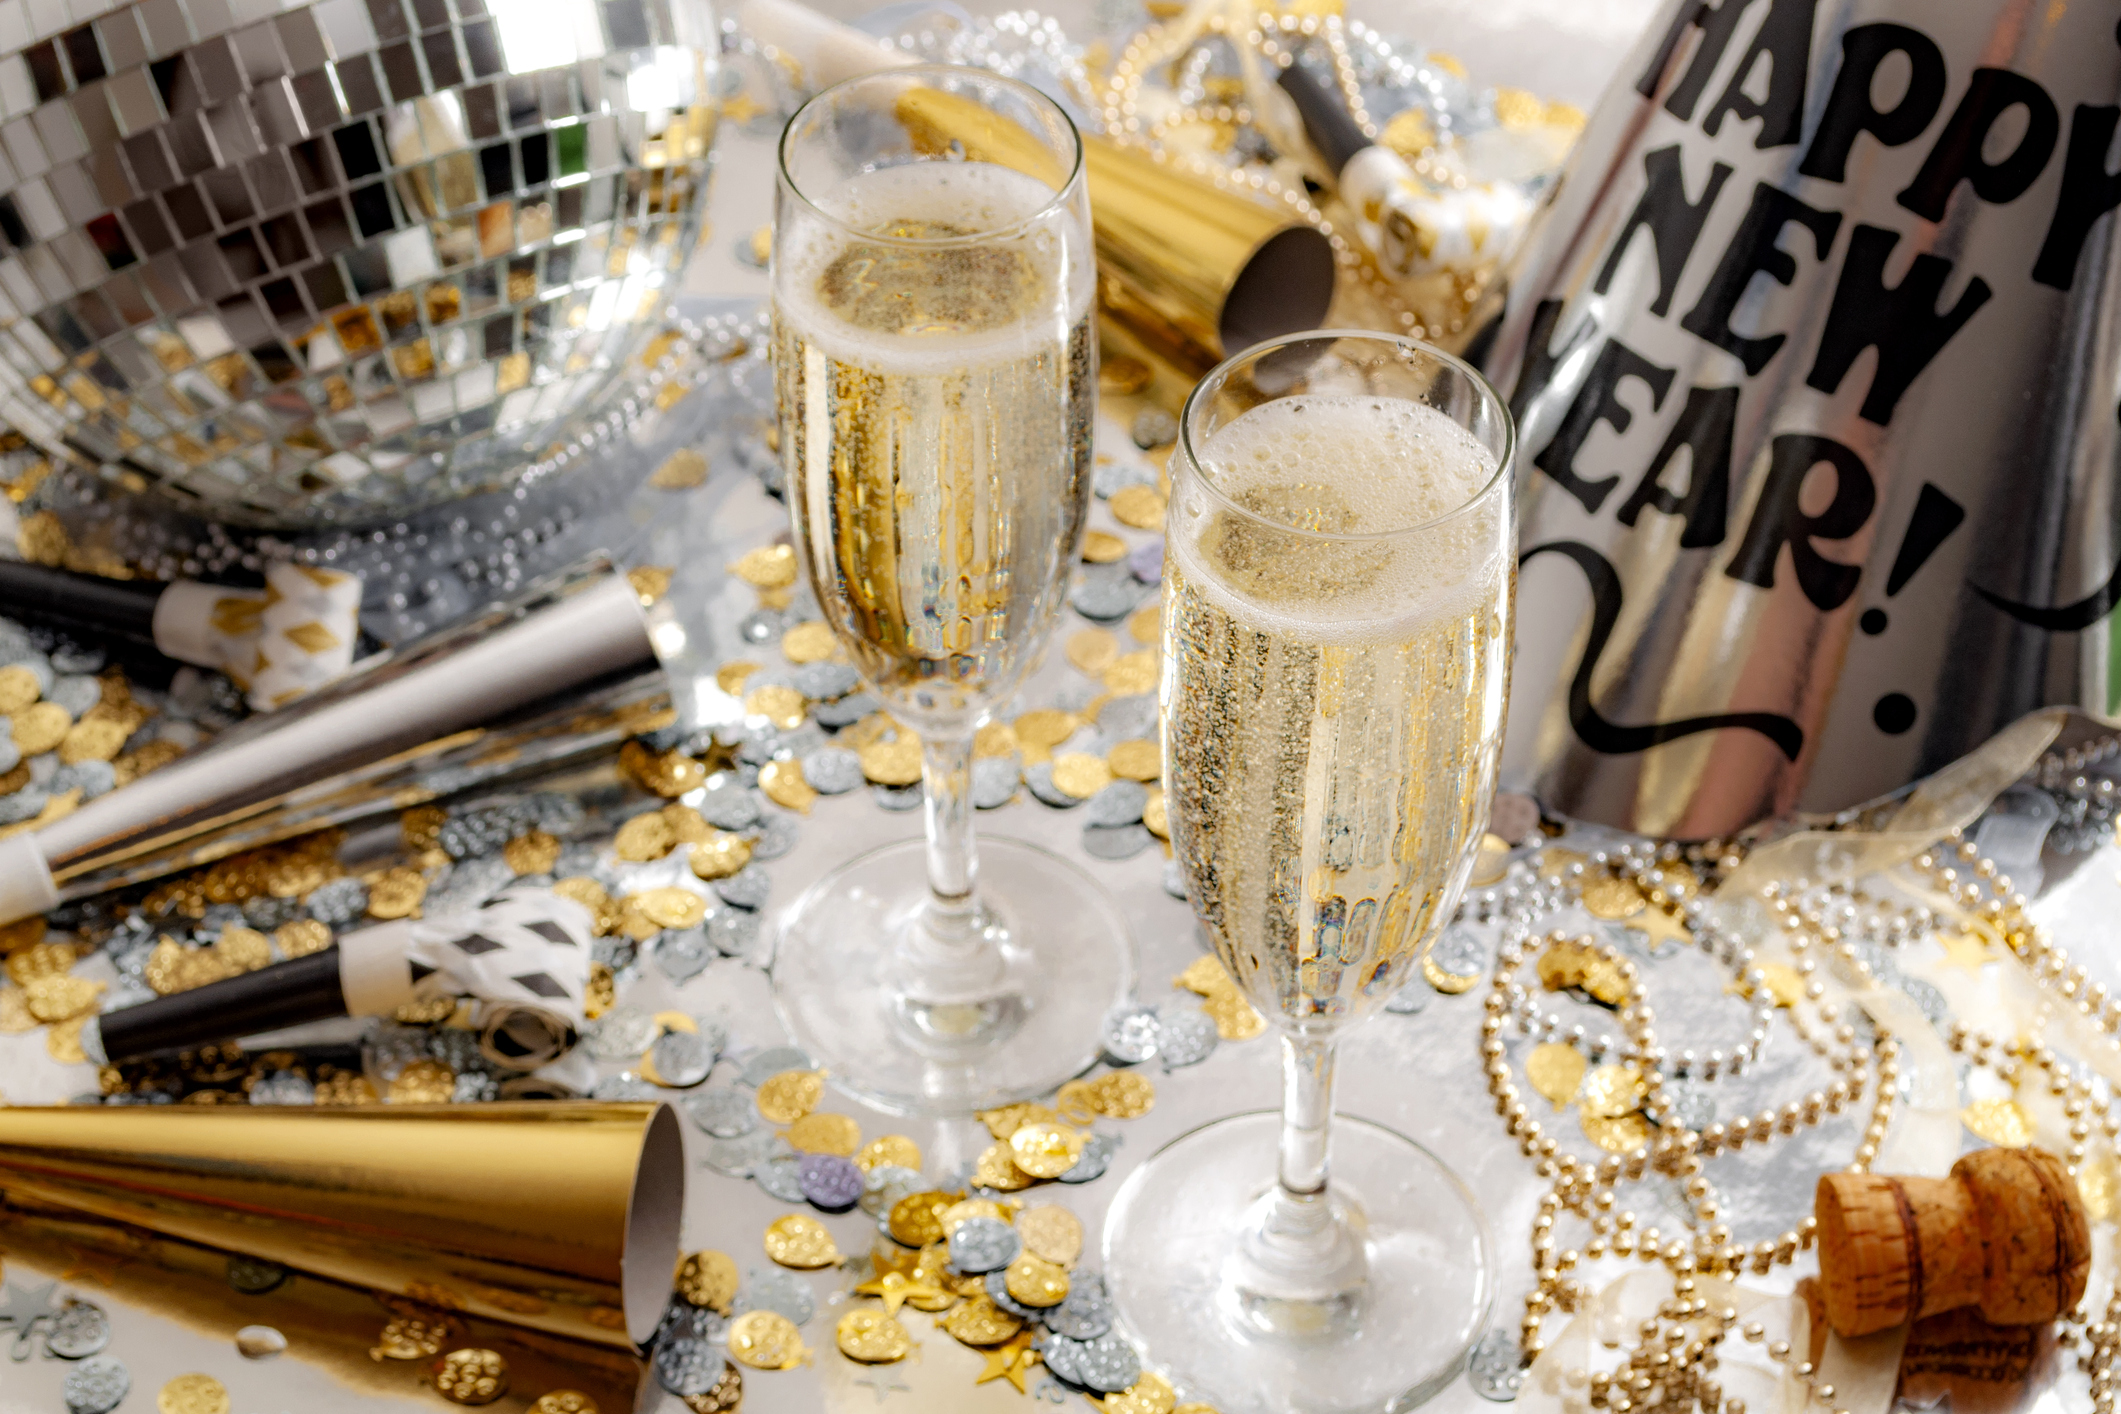 New Year's Eve Myrtle Beach - Welcome 2020 | Myrtle Beach Hotels Blog